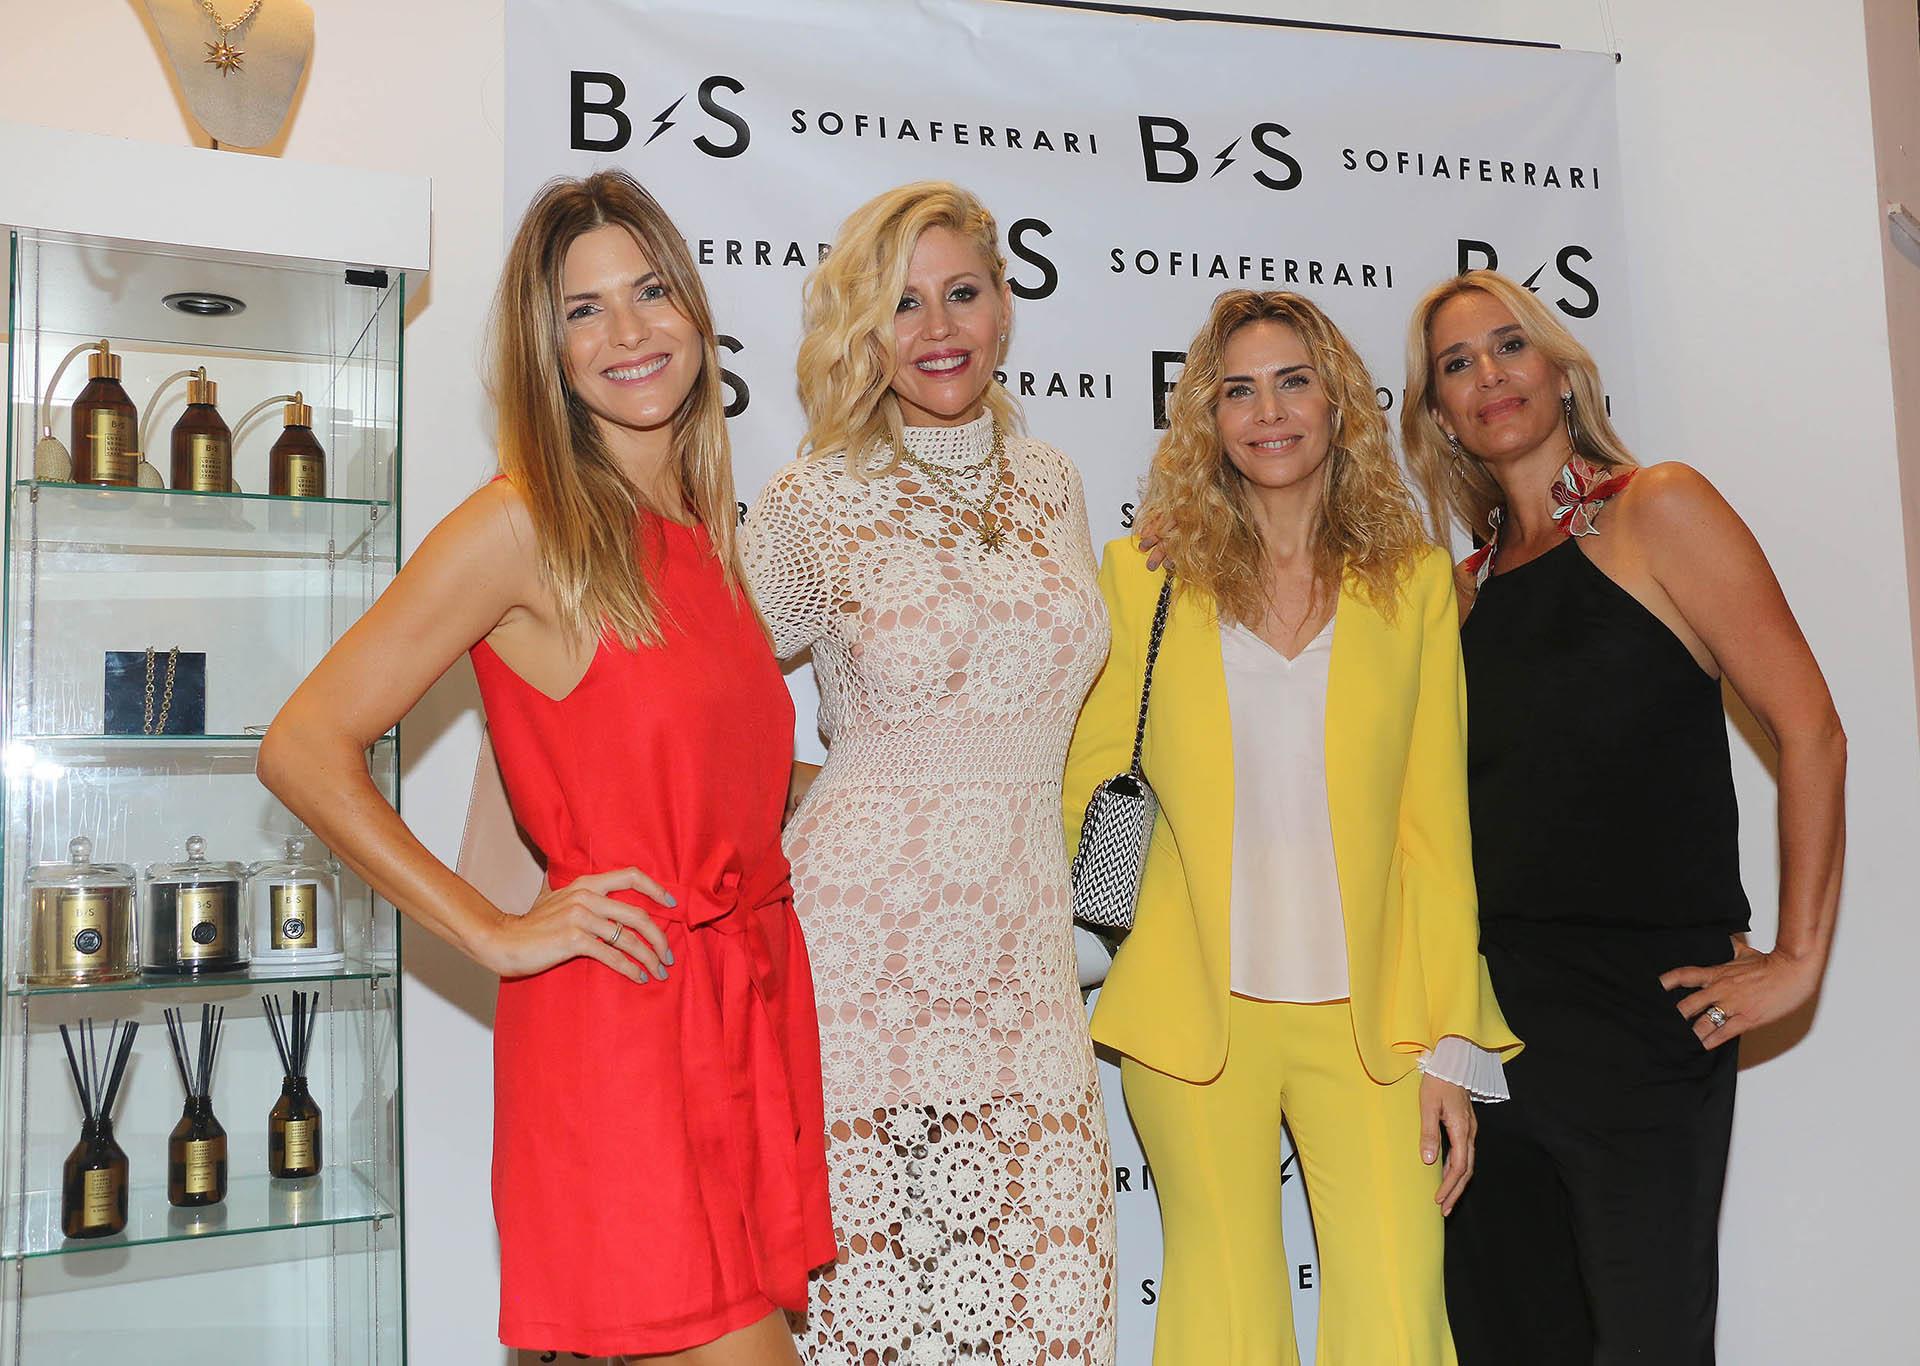 Barbie Simons con Pía Slapka, Adriana Salonia y su socia Sofía Ferrari